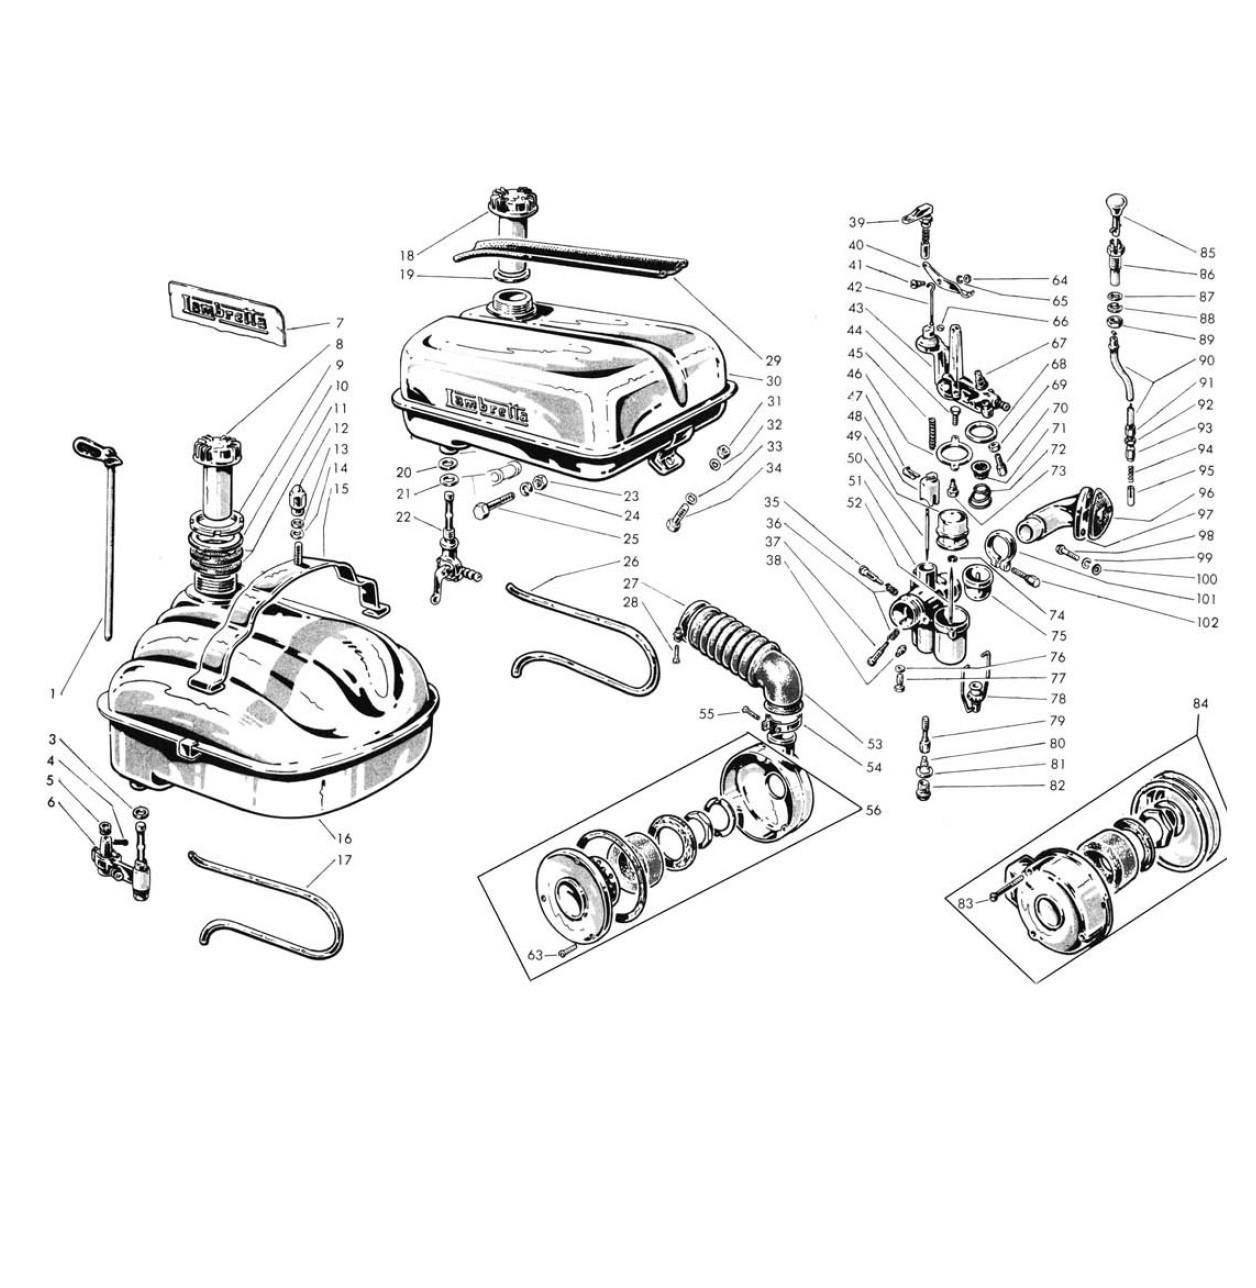 Carburatore e Serbatoio (Tav.9)